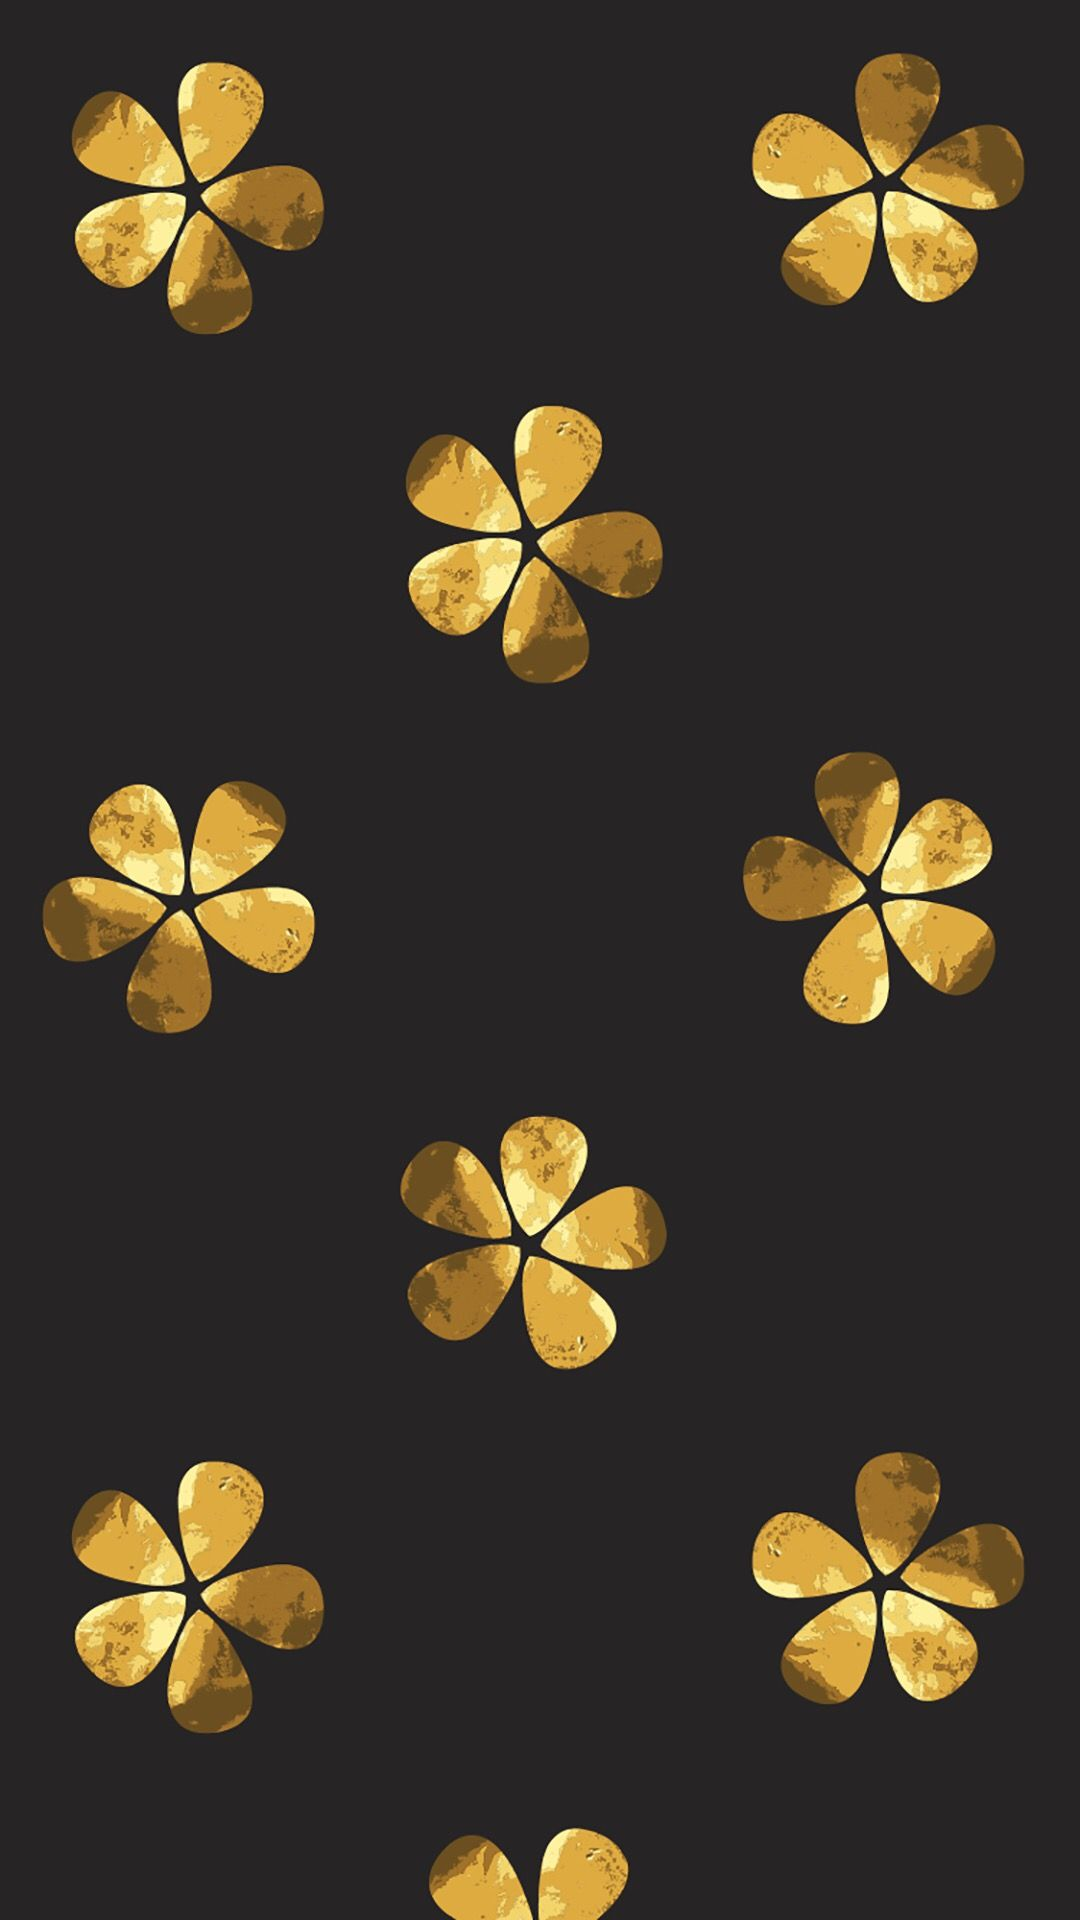 Black And Gold Flowers Wallpaper Iphone Flowery Desktop